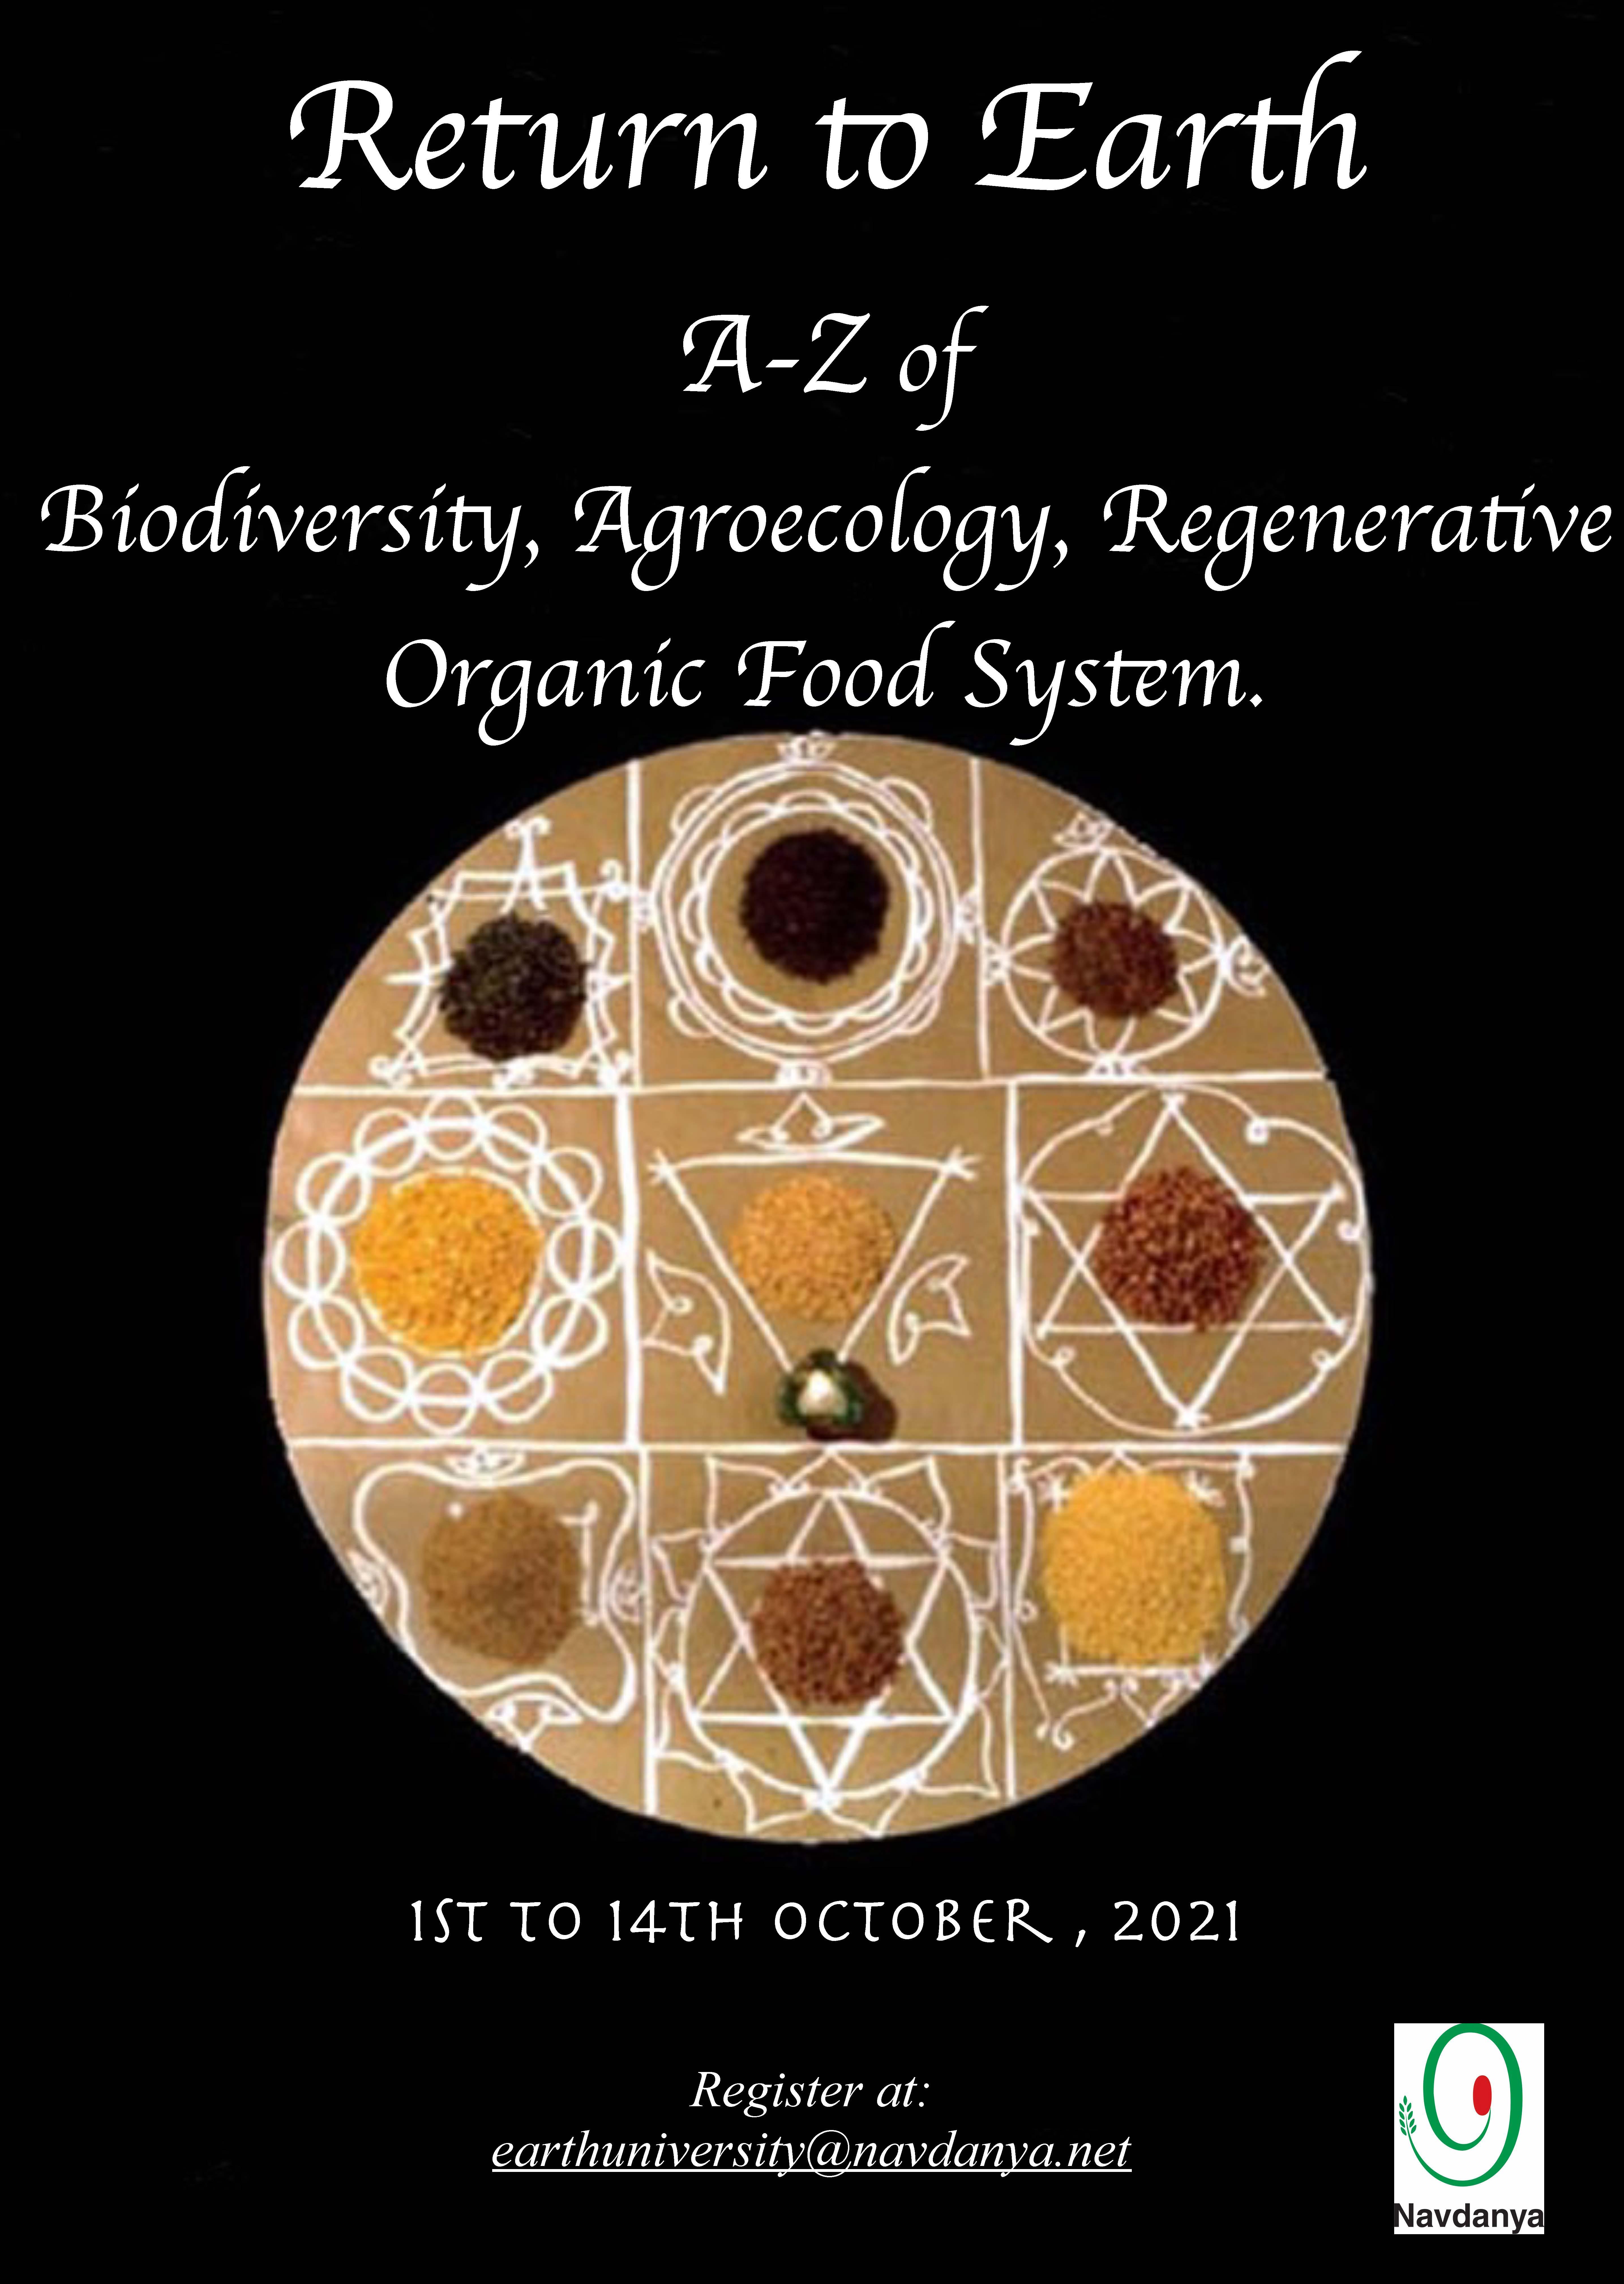 Return to Earth: AZ of Biodiversity, Agroecology, Regenerative Organic Food System